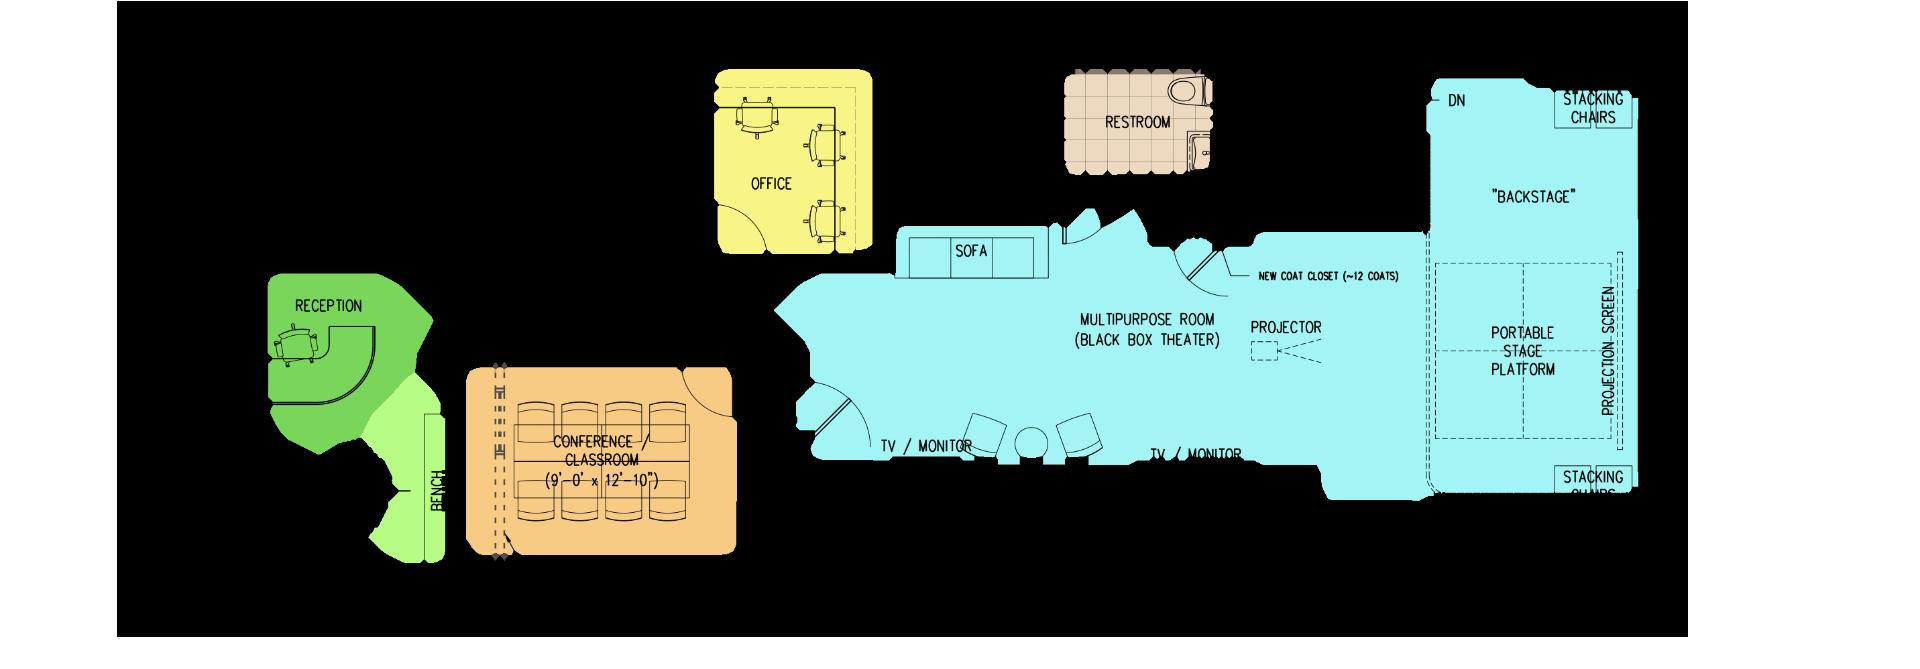 Impact-Safe-Space-Floor-Plan.png